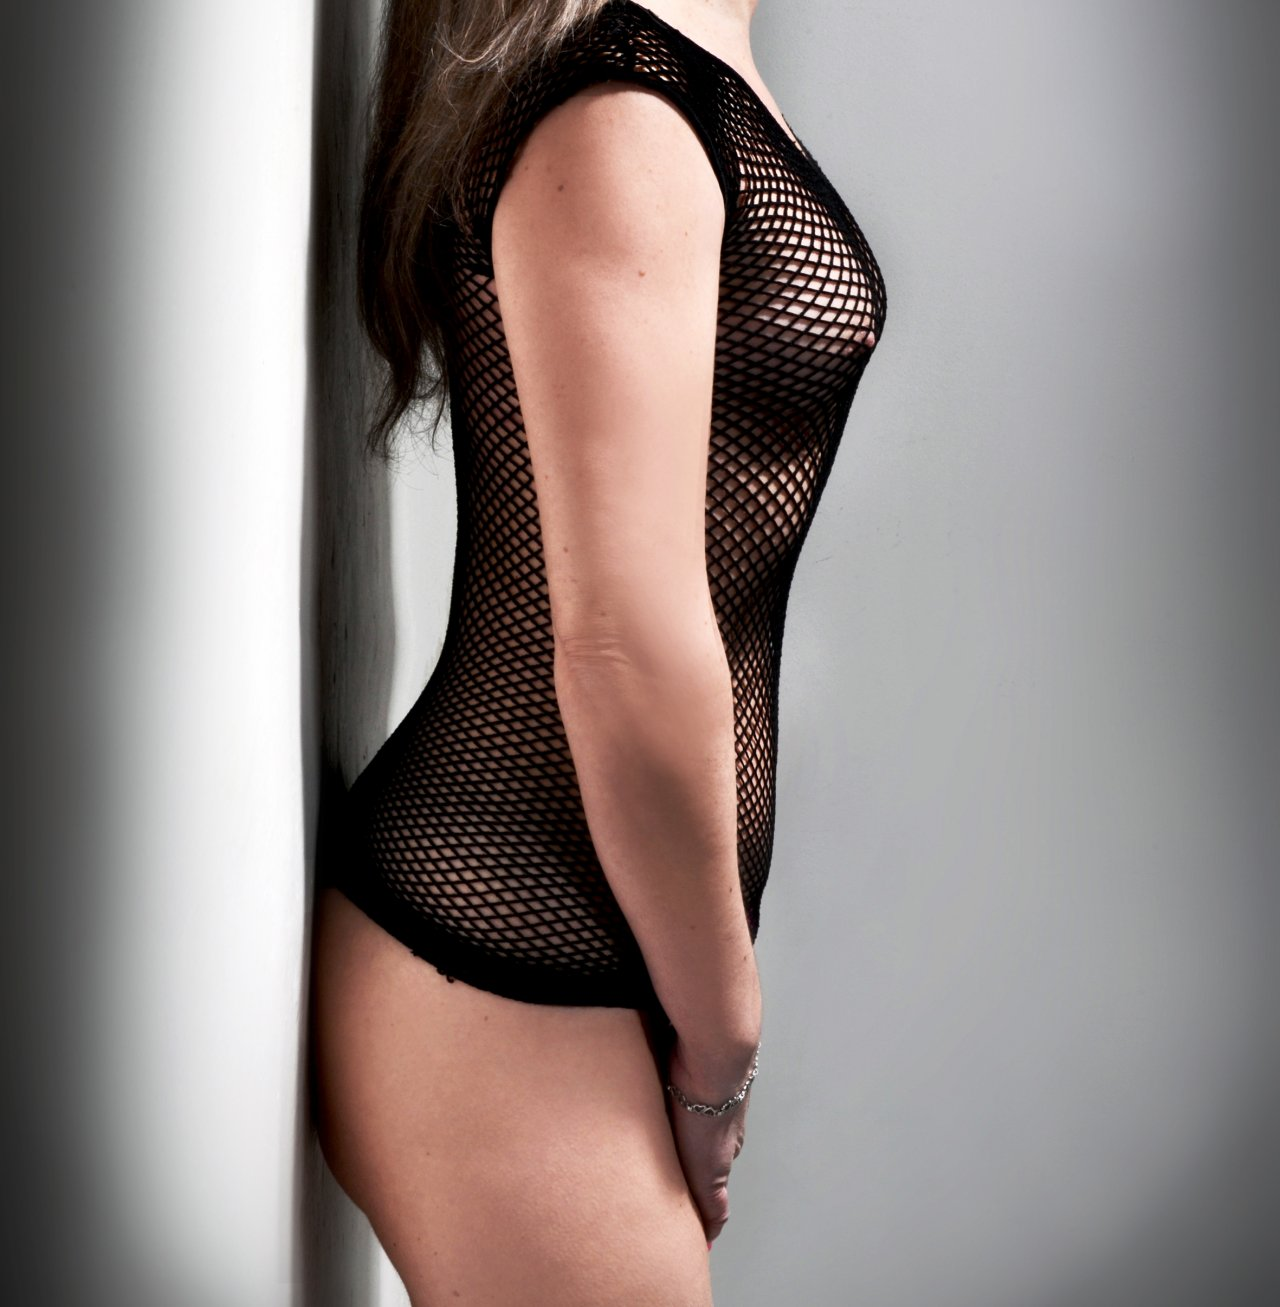 Perov - Erotick seznamka SexNavigace